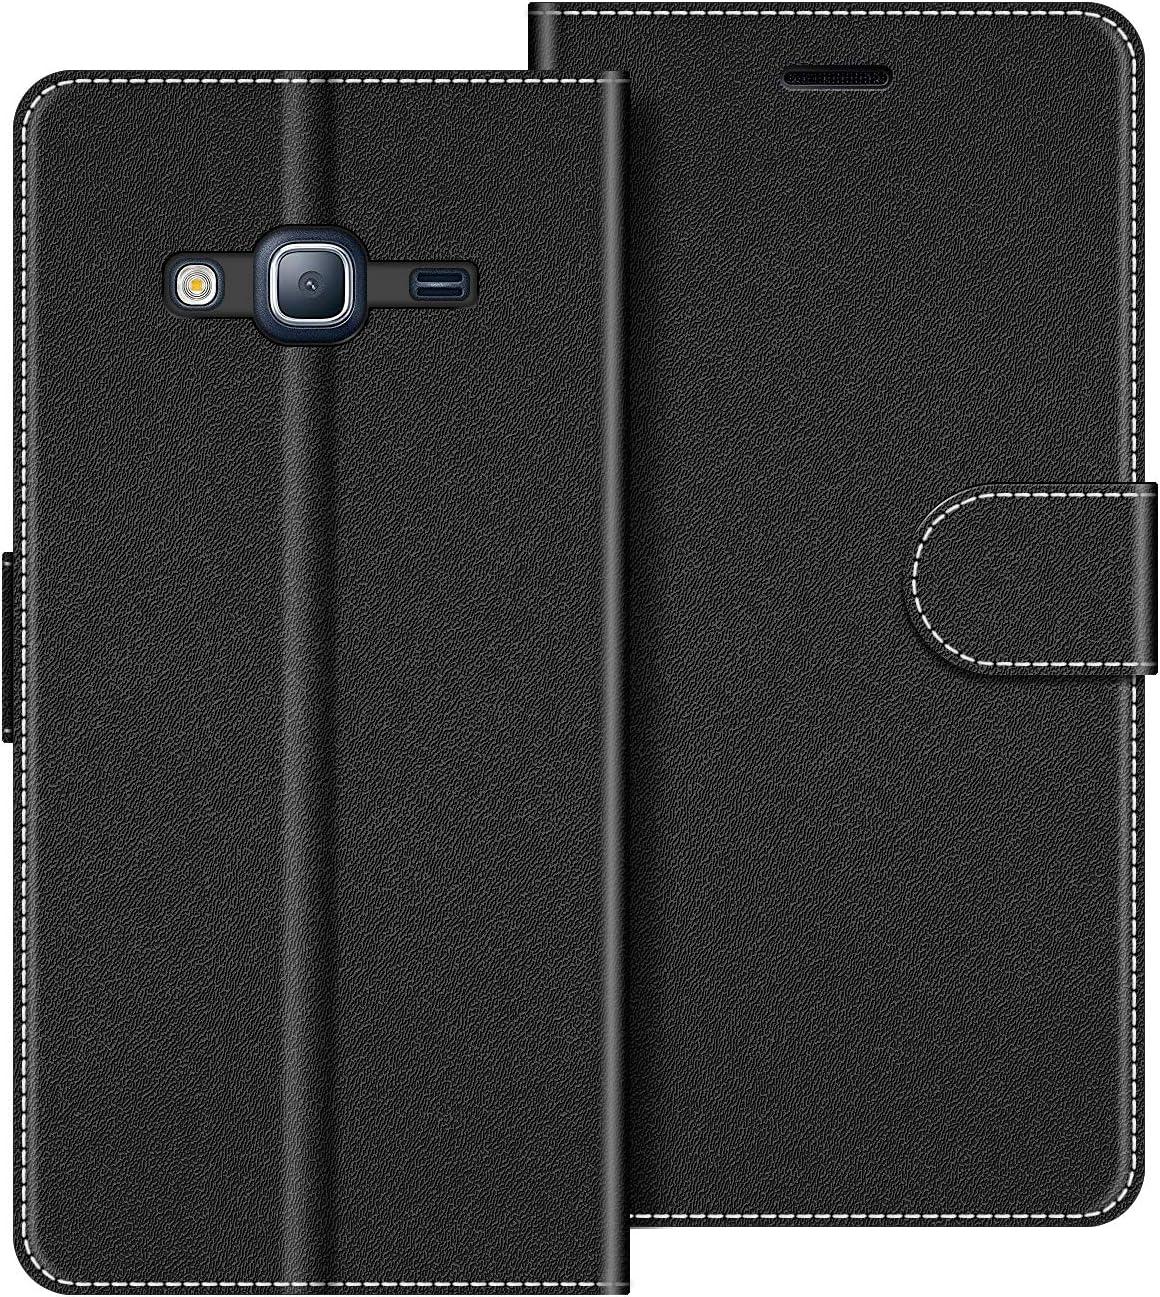 COODIO Funda Samsung Galaxy J3 2016 con Tapa, Funda Movil Samsung J3 2016, Funda Libro Galaxy J3 2016 Carcasa Magnético Funda para Samsung Galaxy J3 2016, Negro